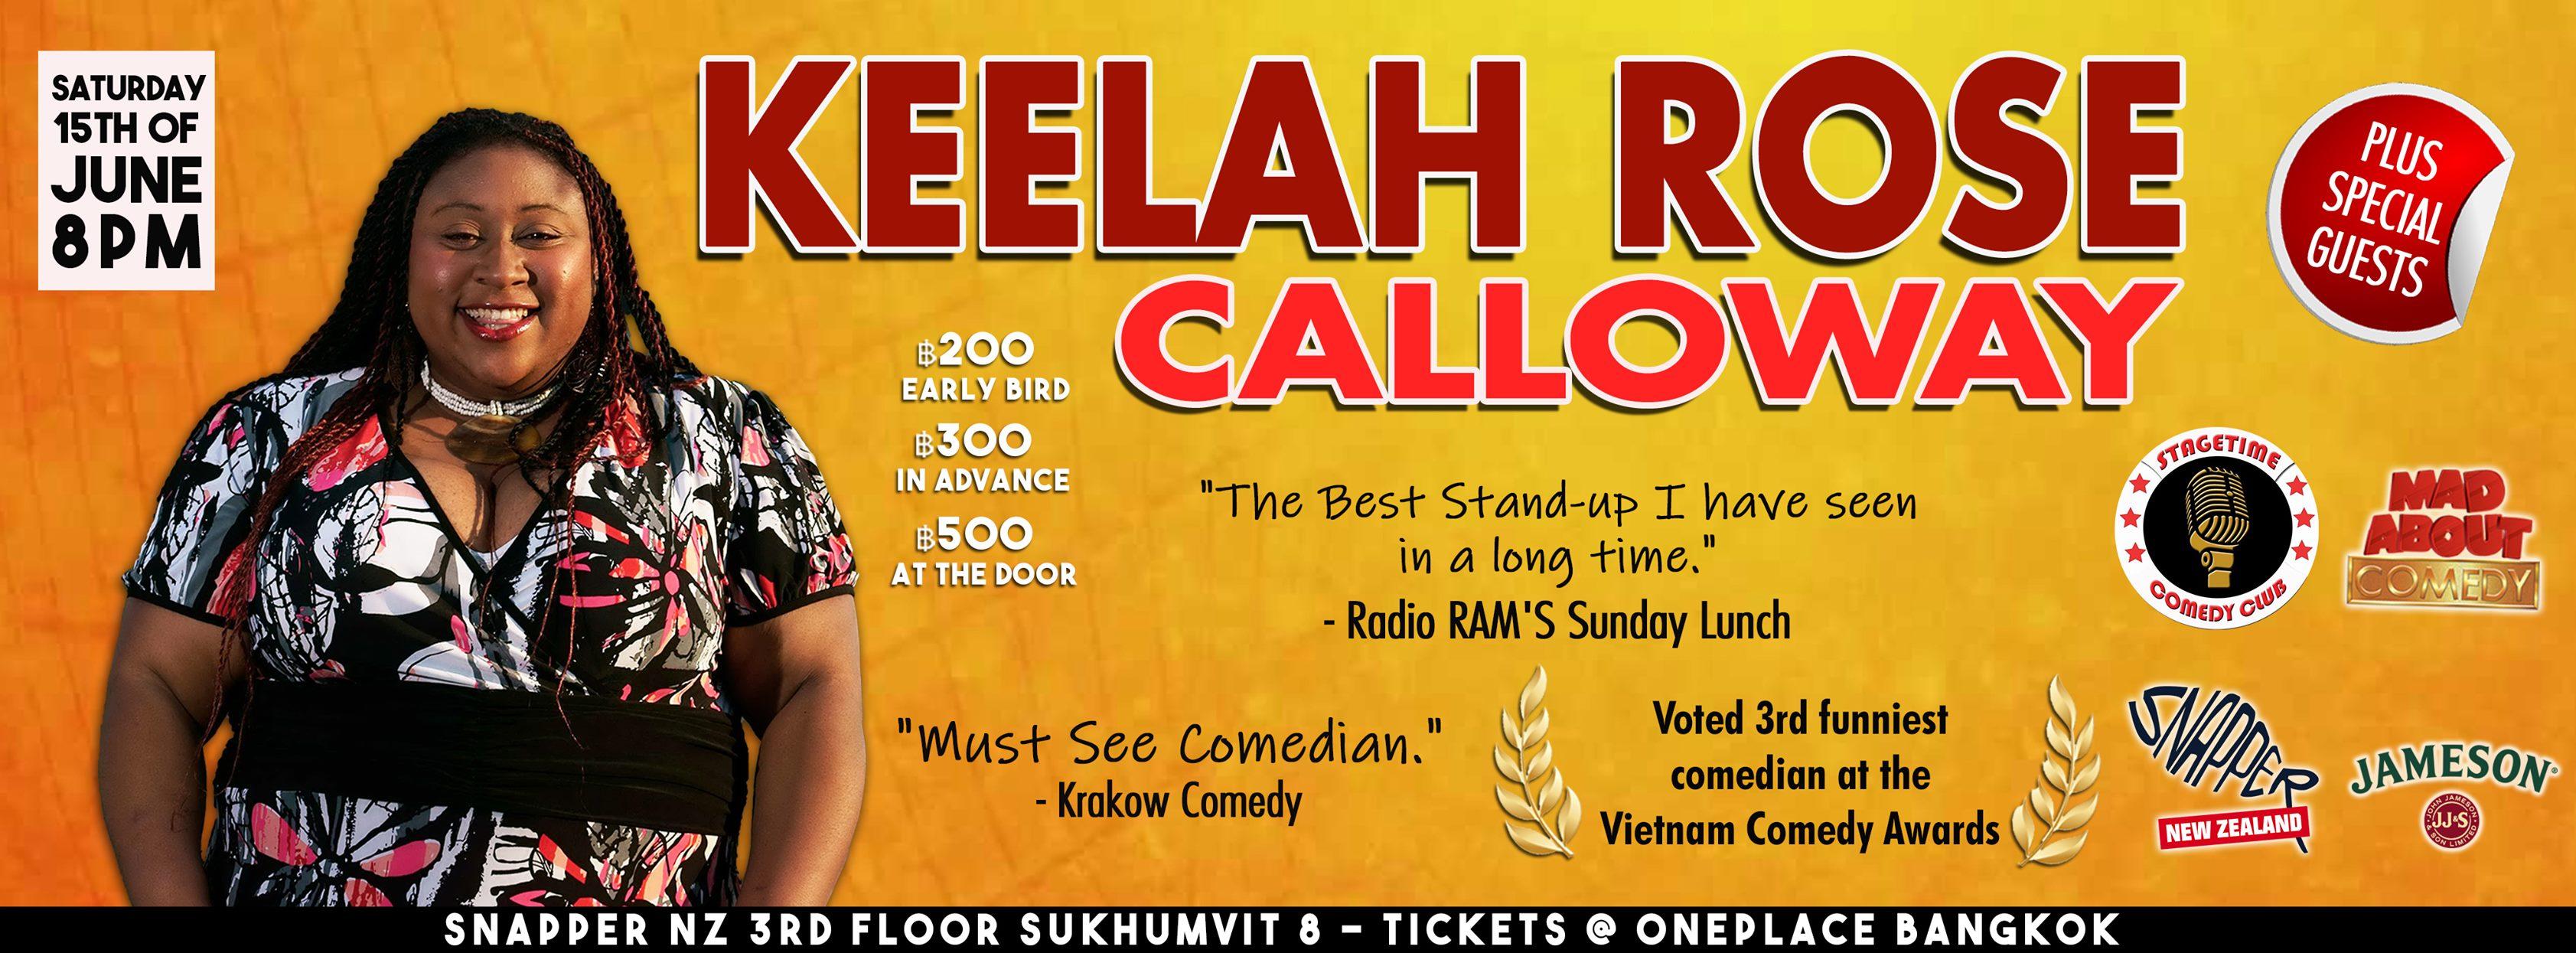 Keelah Rose Calloway. Event Comedy